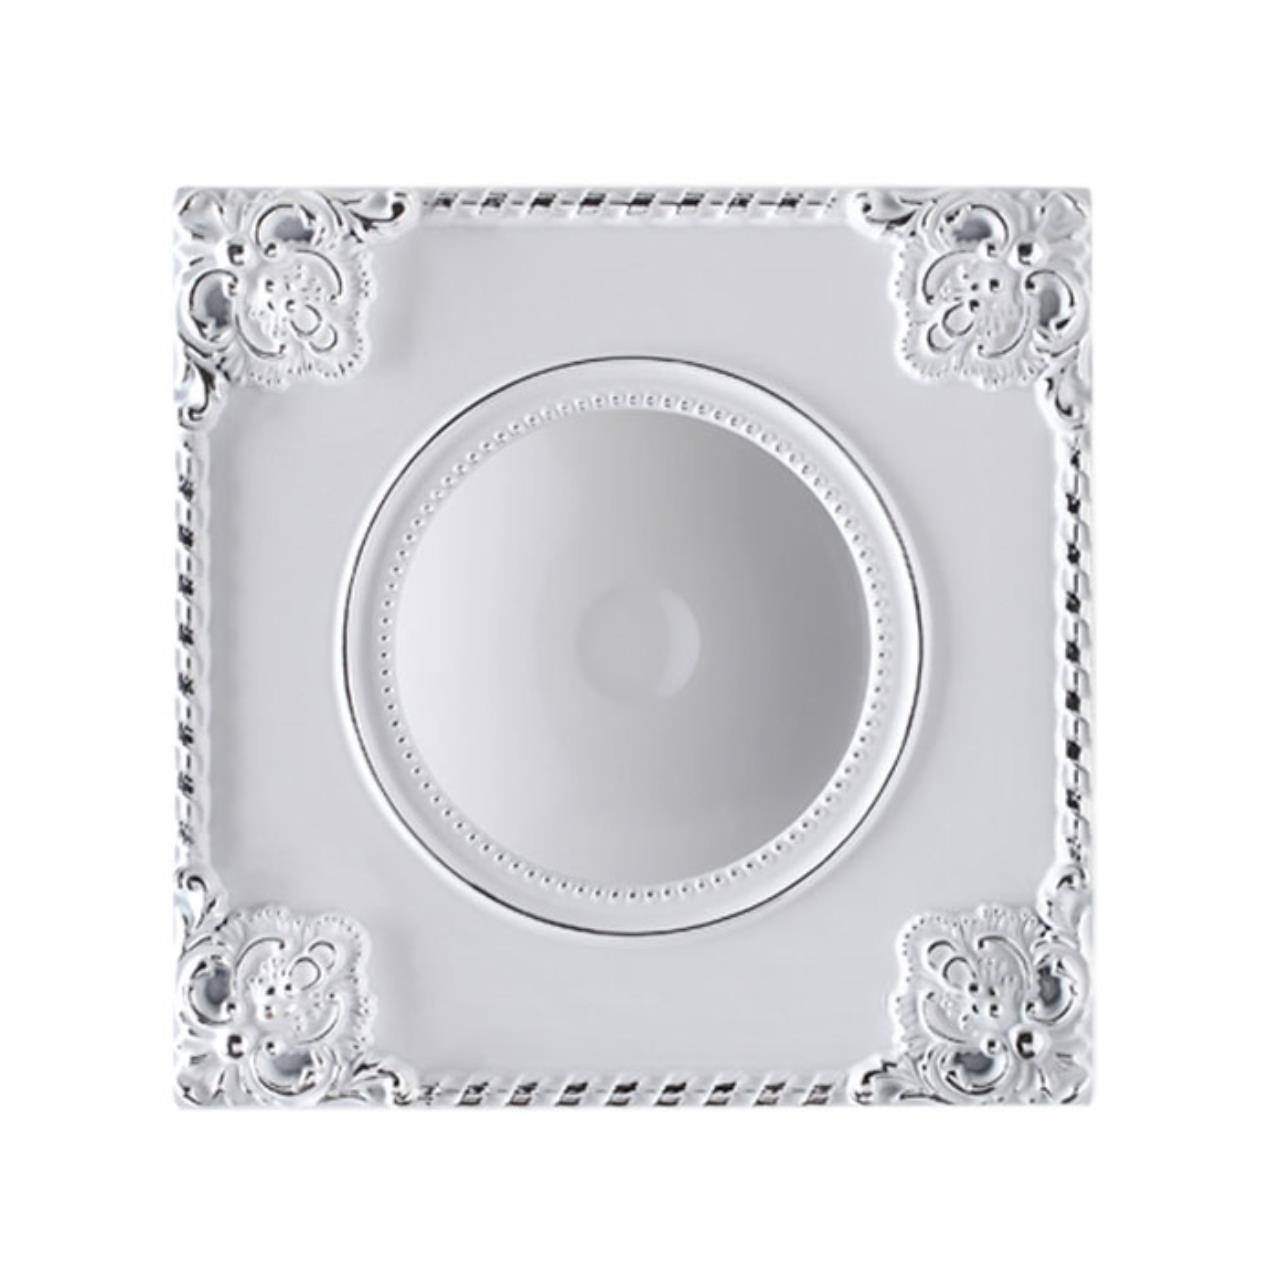 357618 SPOT NT18 141 белый/хром Встраиваемый светильник IP20 LED 3000K 9W 85-265V NOVEL